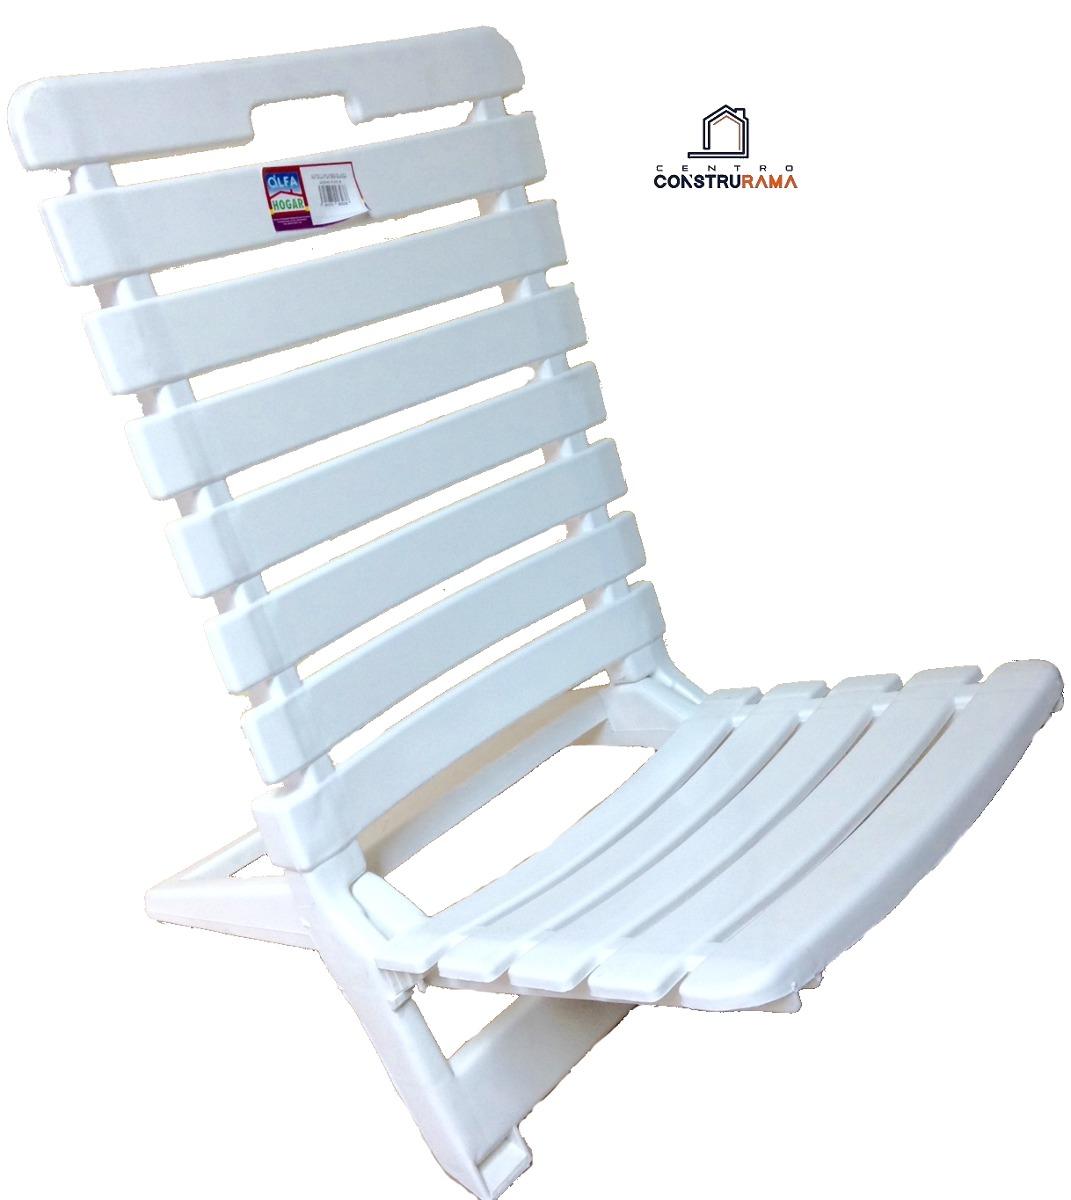 Silla Plastica Blanca Plegable Playera Multiuso Hogar Alfa qzVGLUMpS